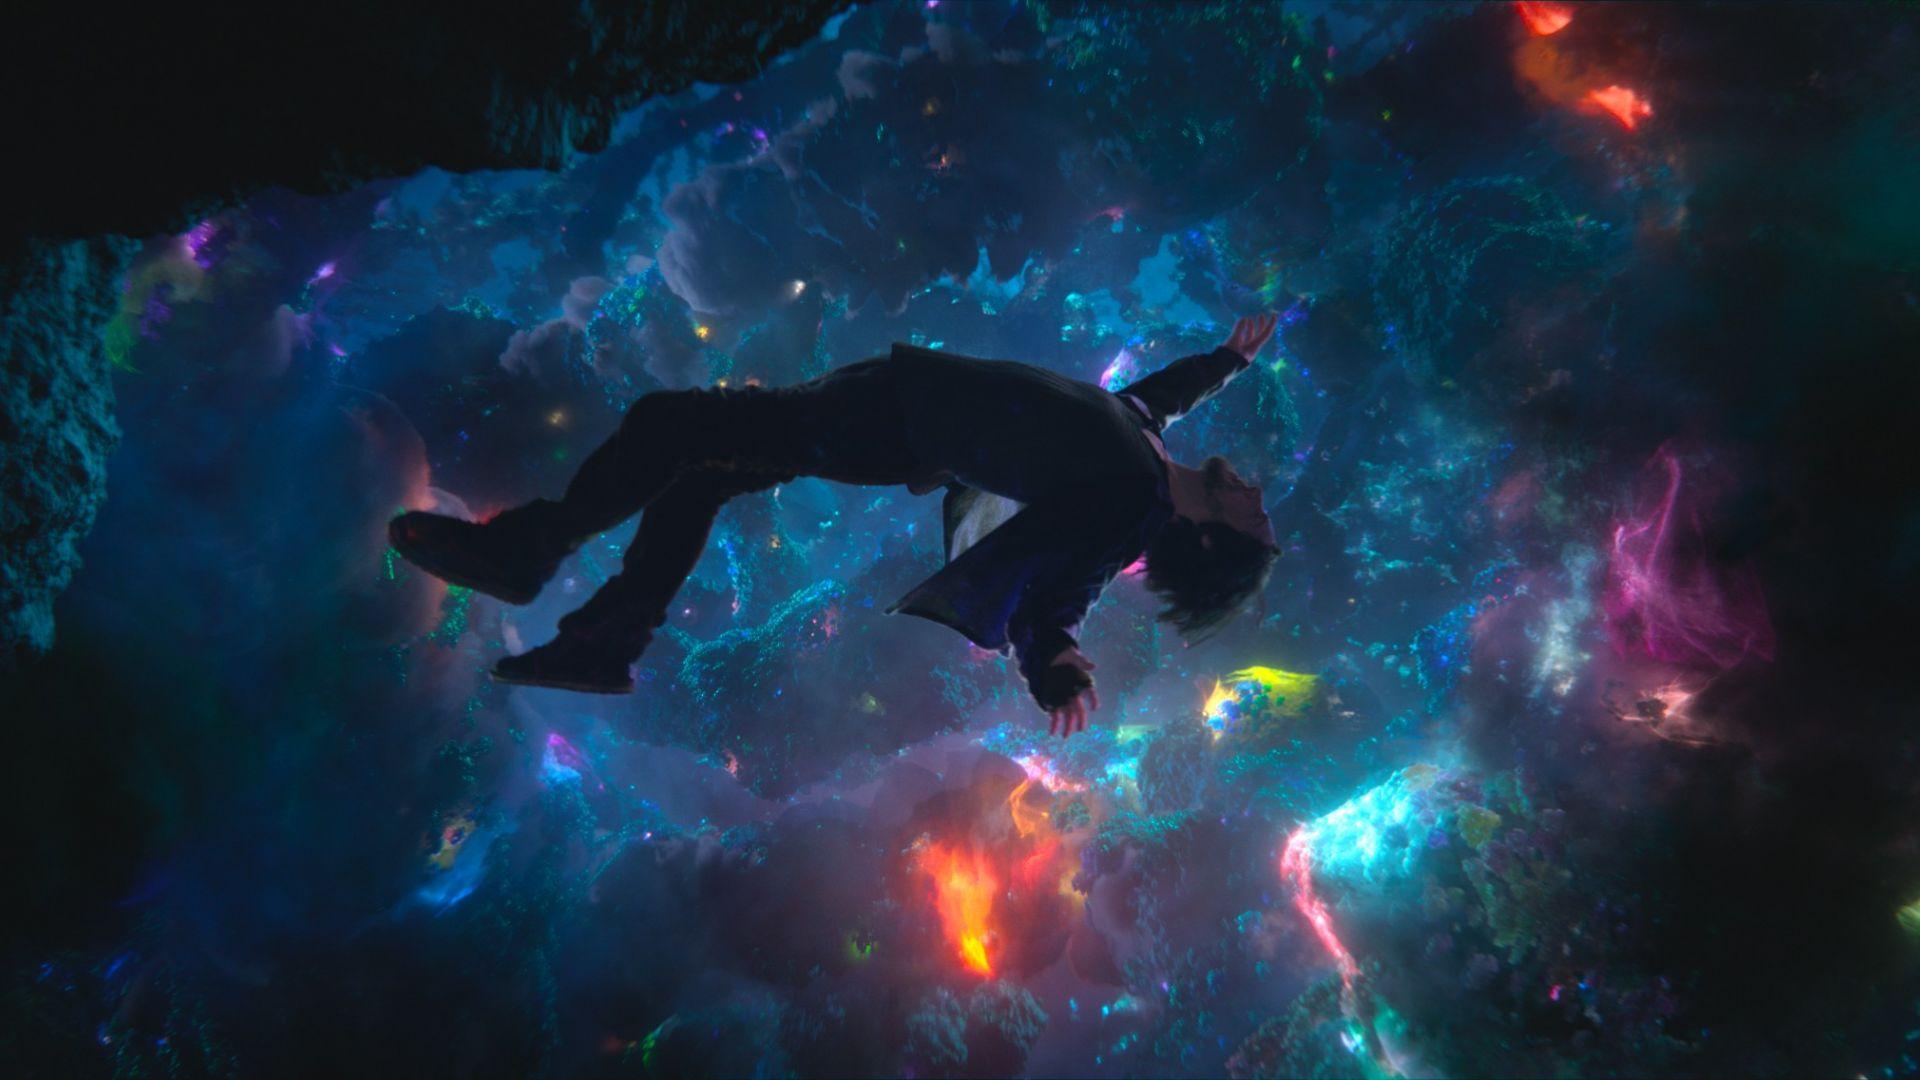 Wallpaper Doctor strange movie, space